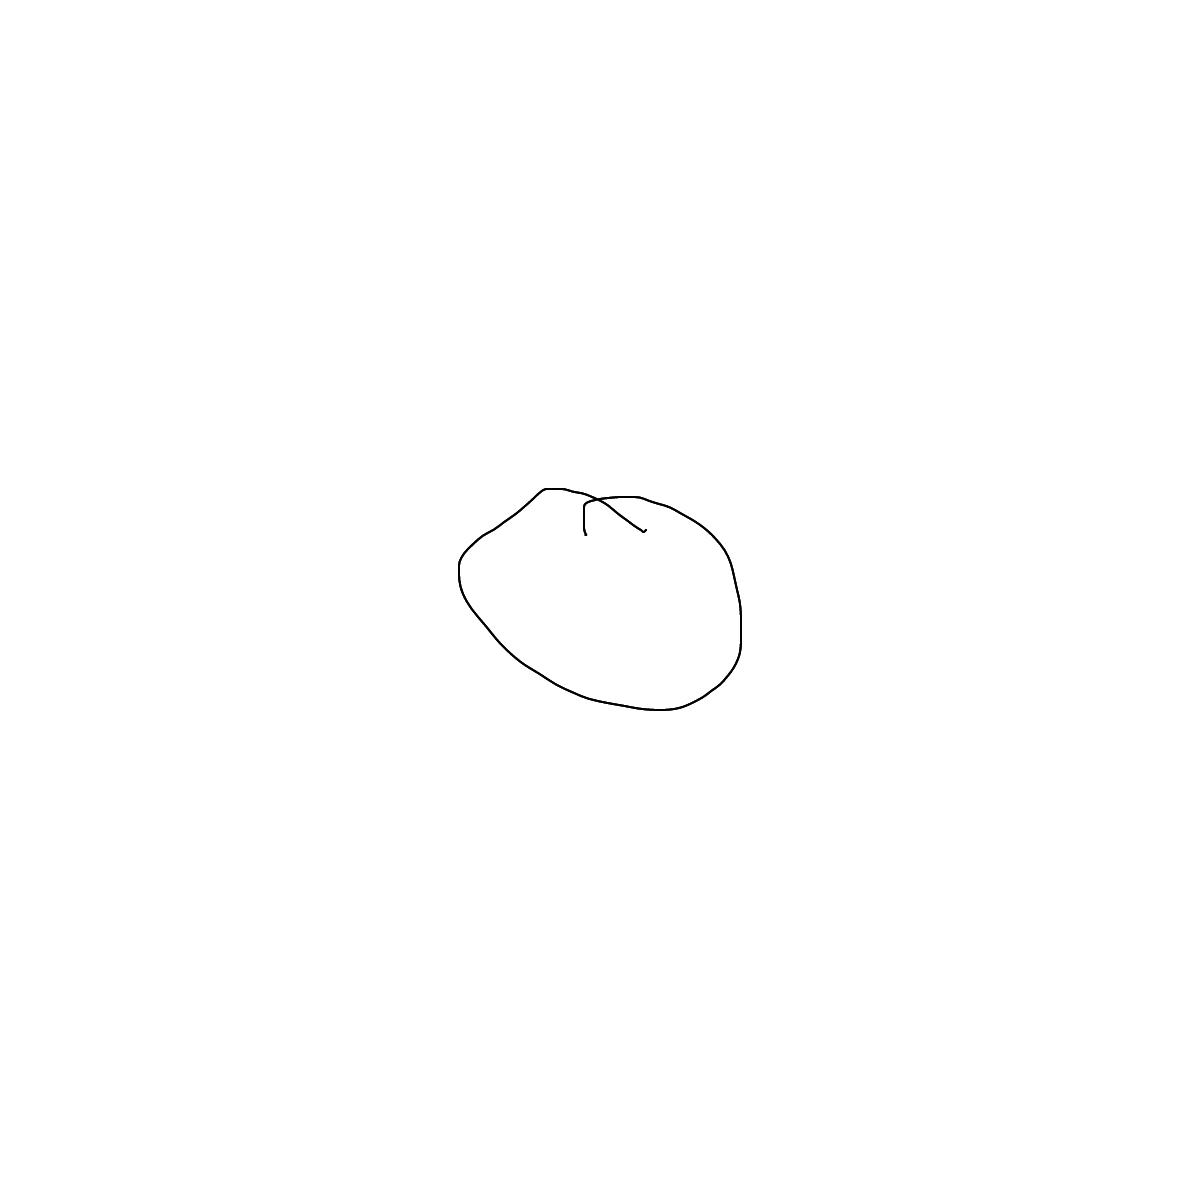 BAAAM drawing#19559 lat:52.5204010009765600lng: 13.4014148712158200